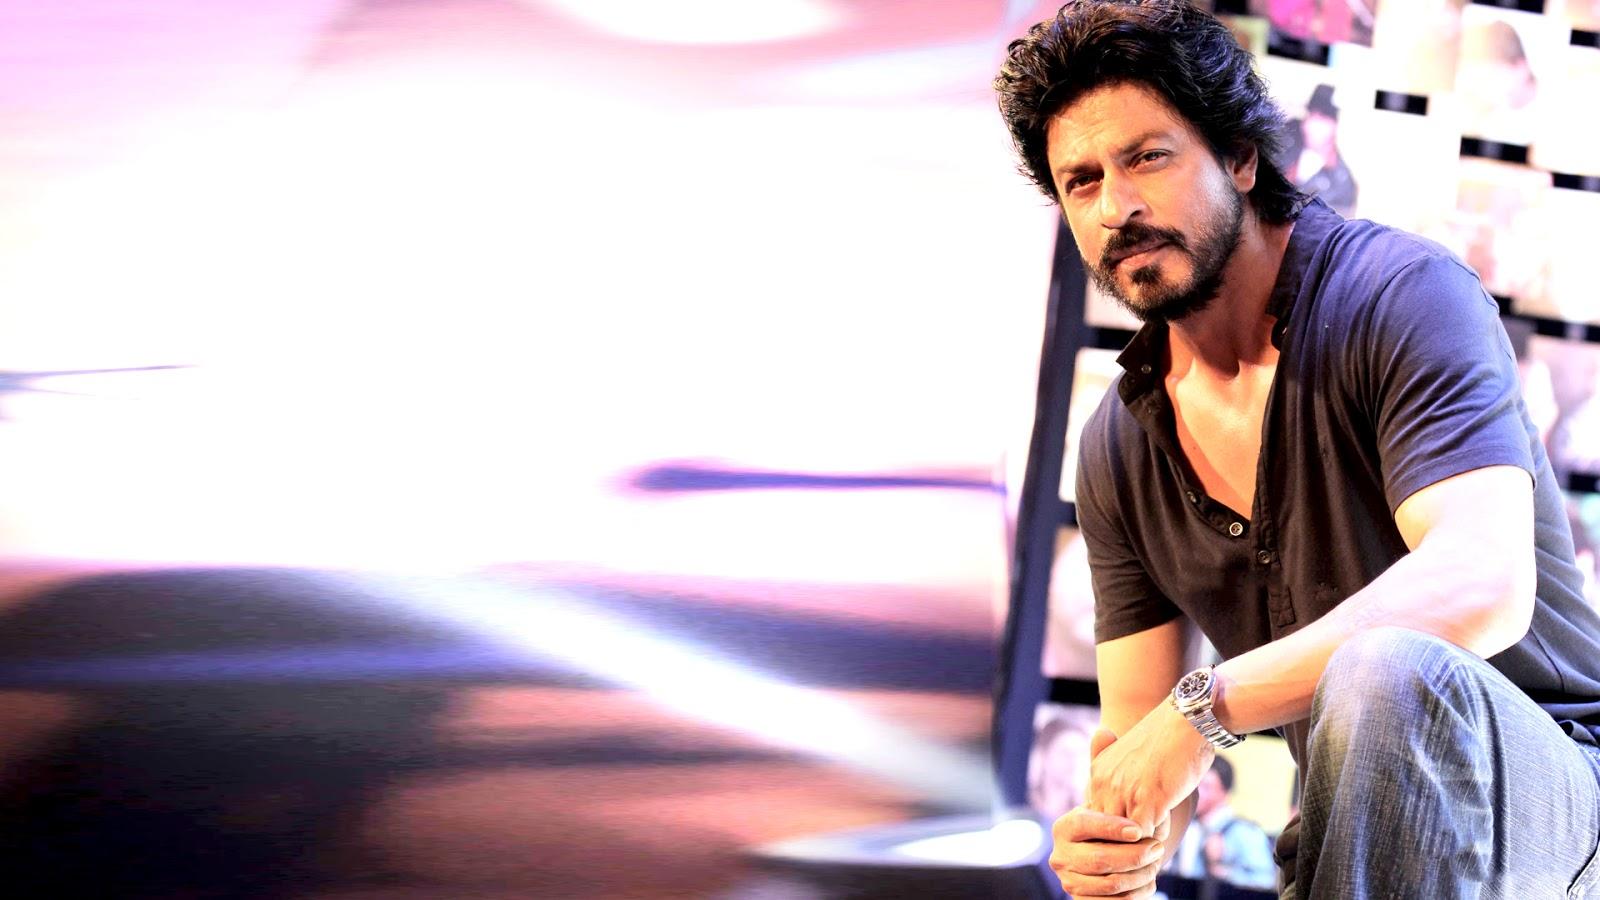 Shahrukh Khan Wallpapers HD Download Free 1080p ...